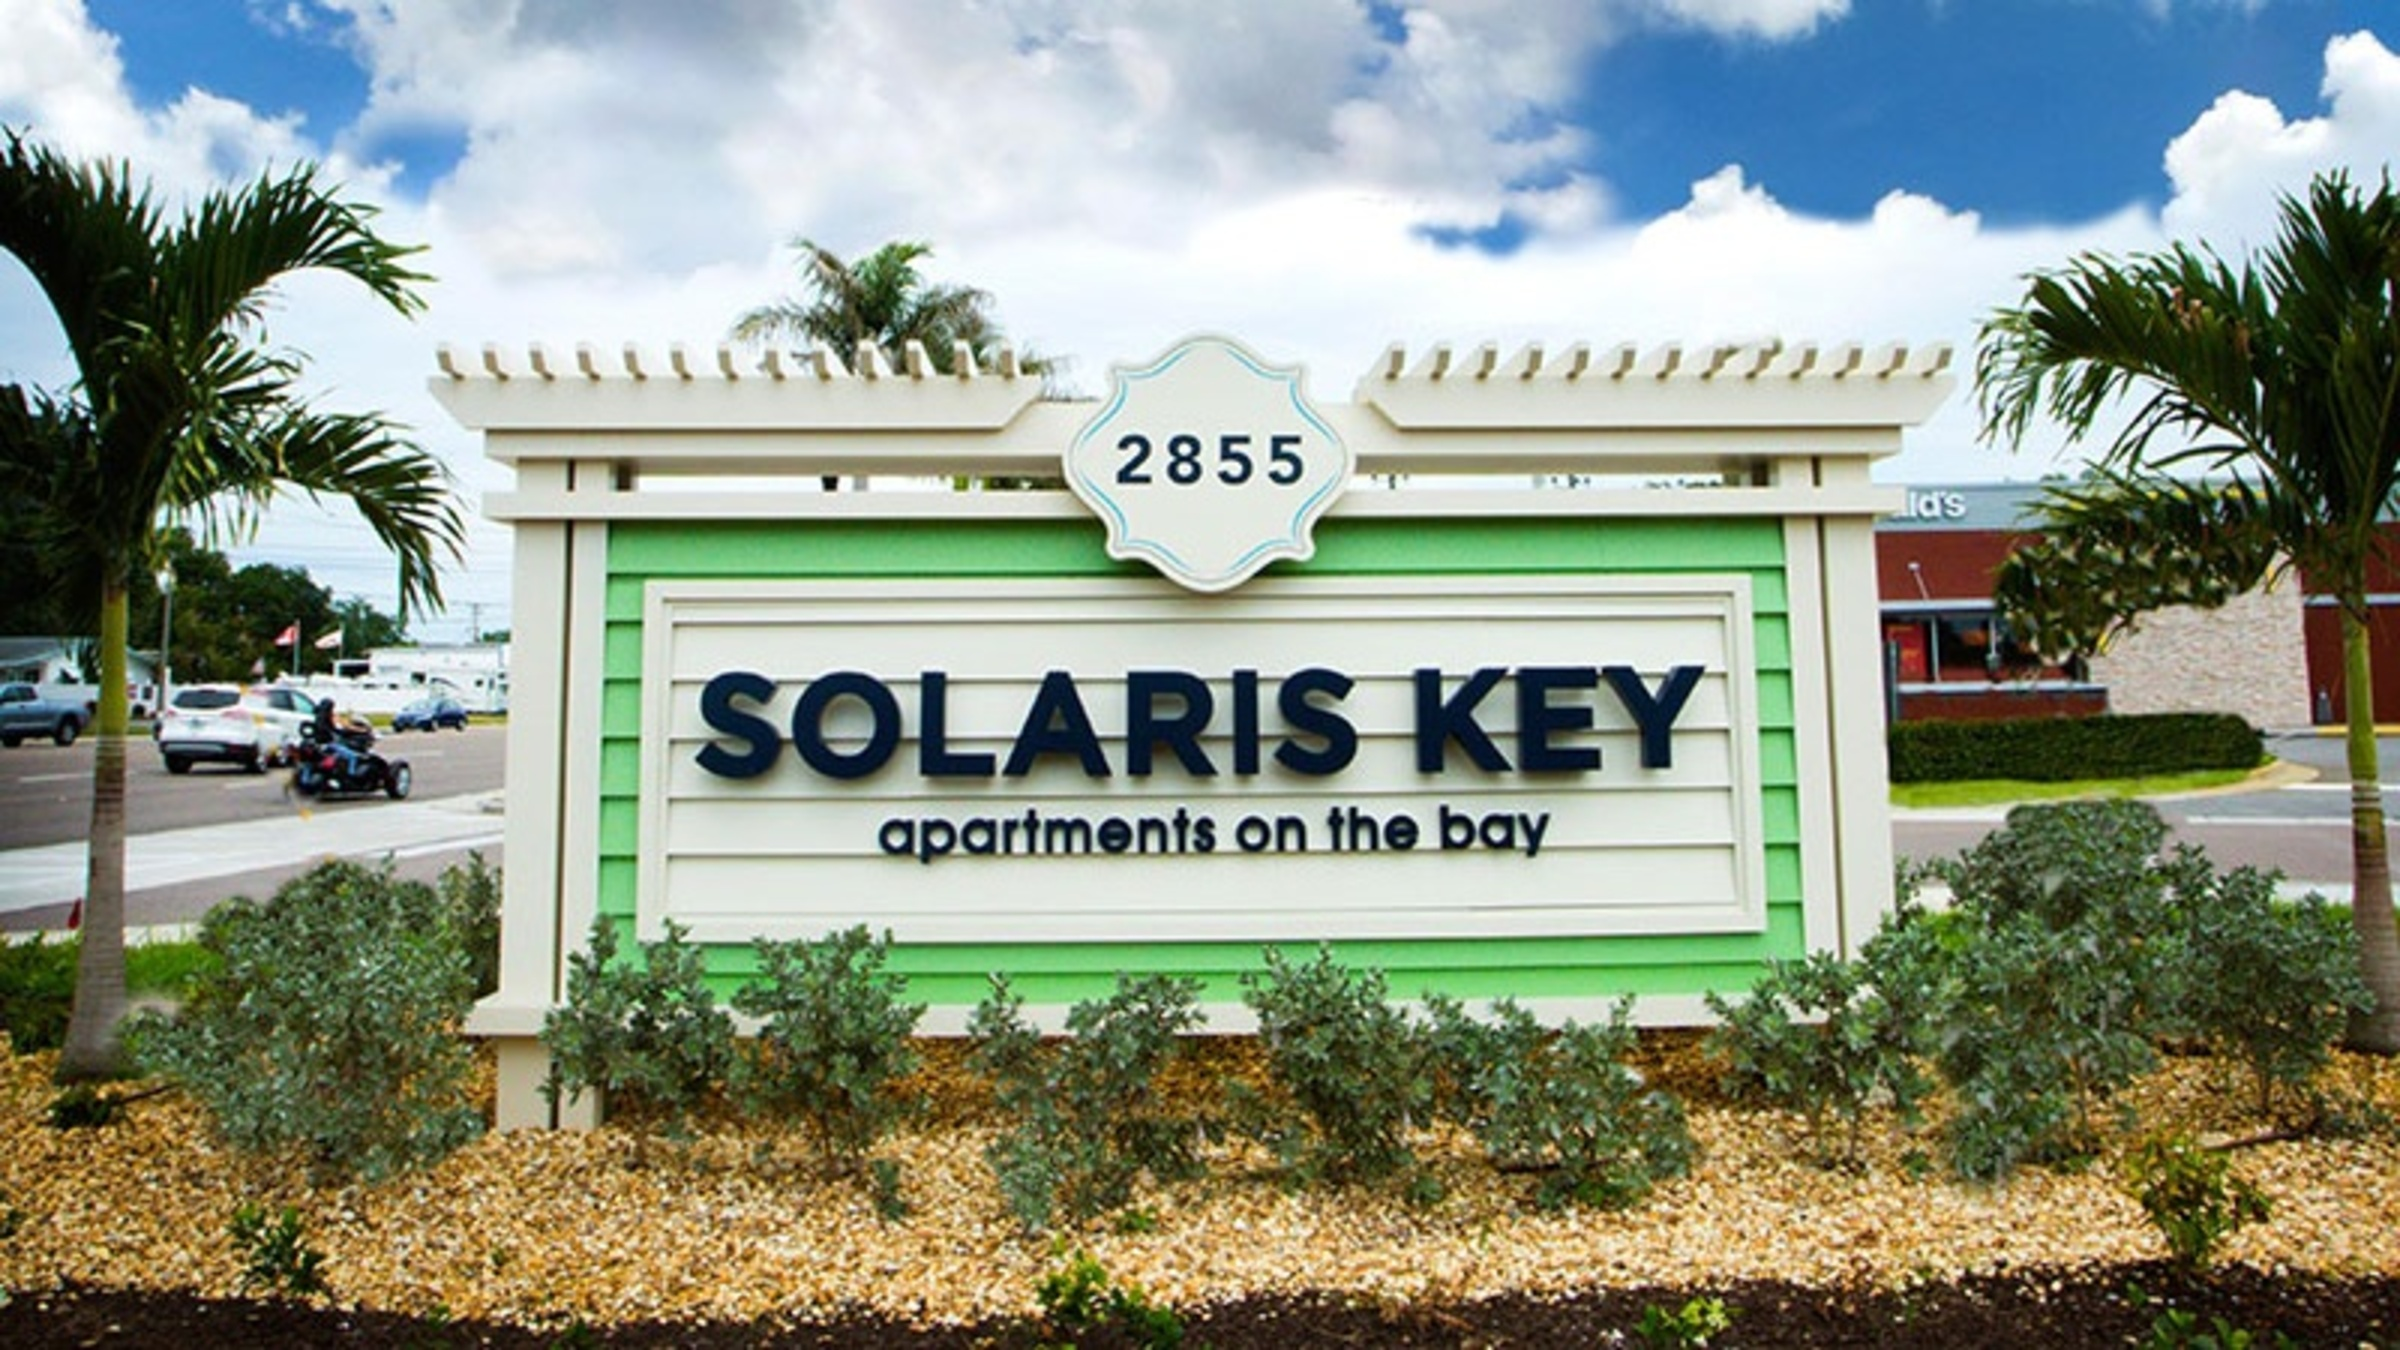 Solaris Key